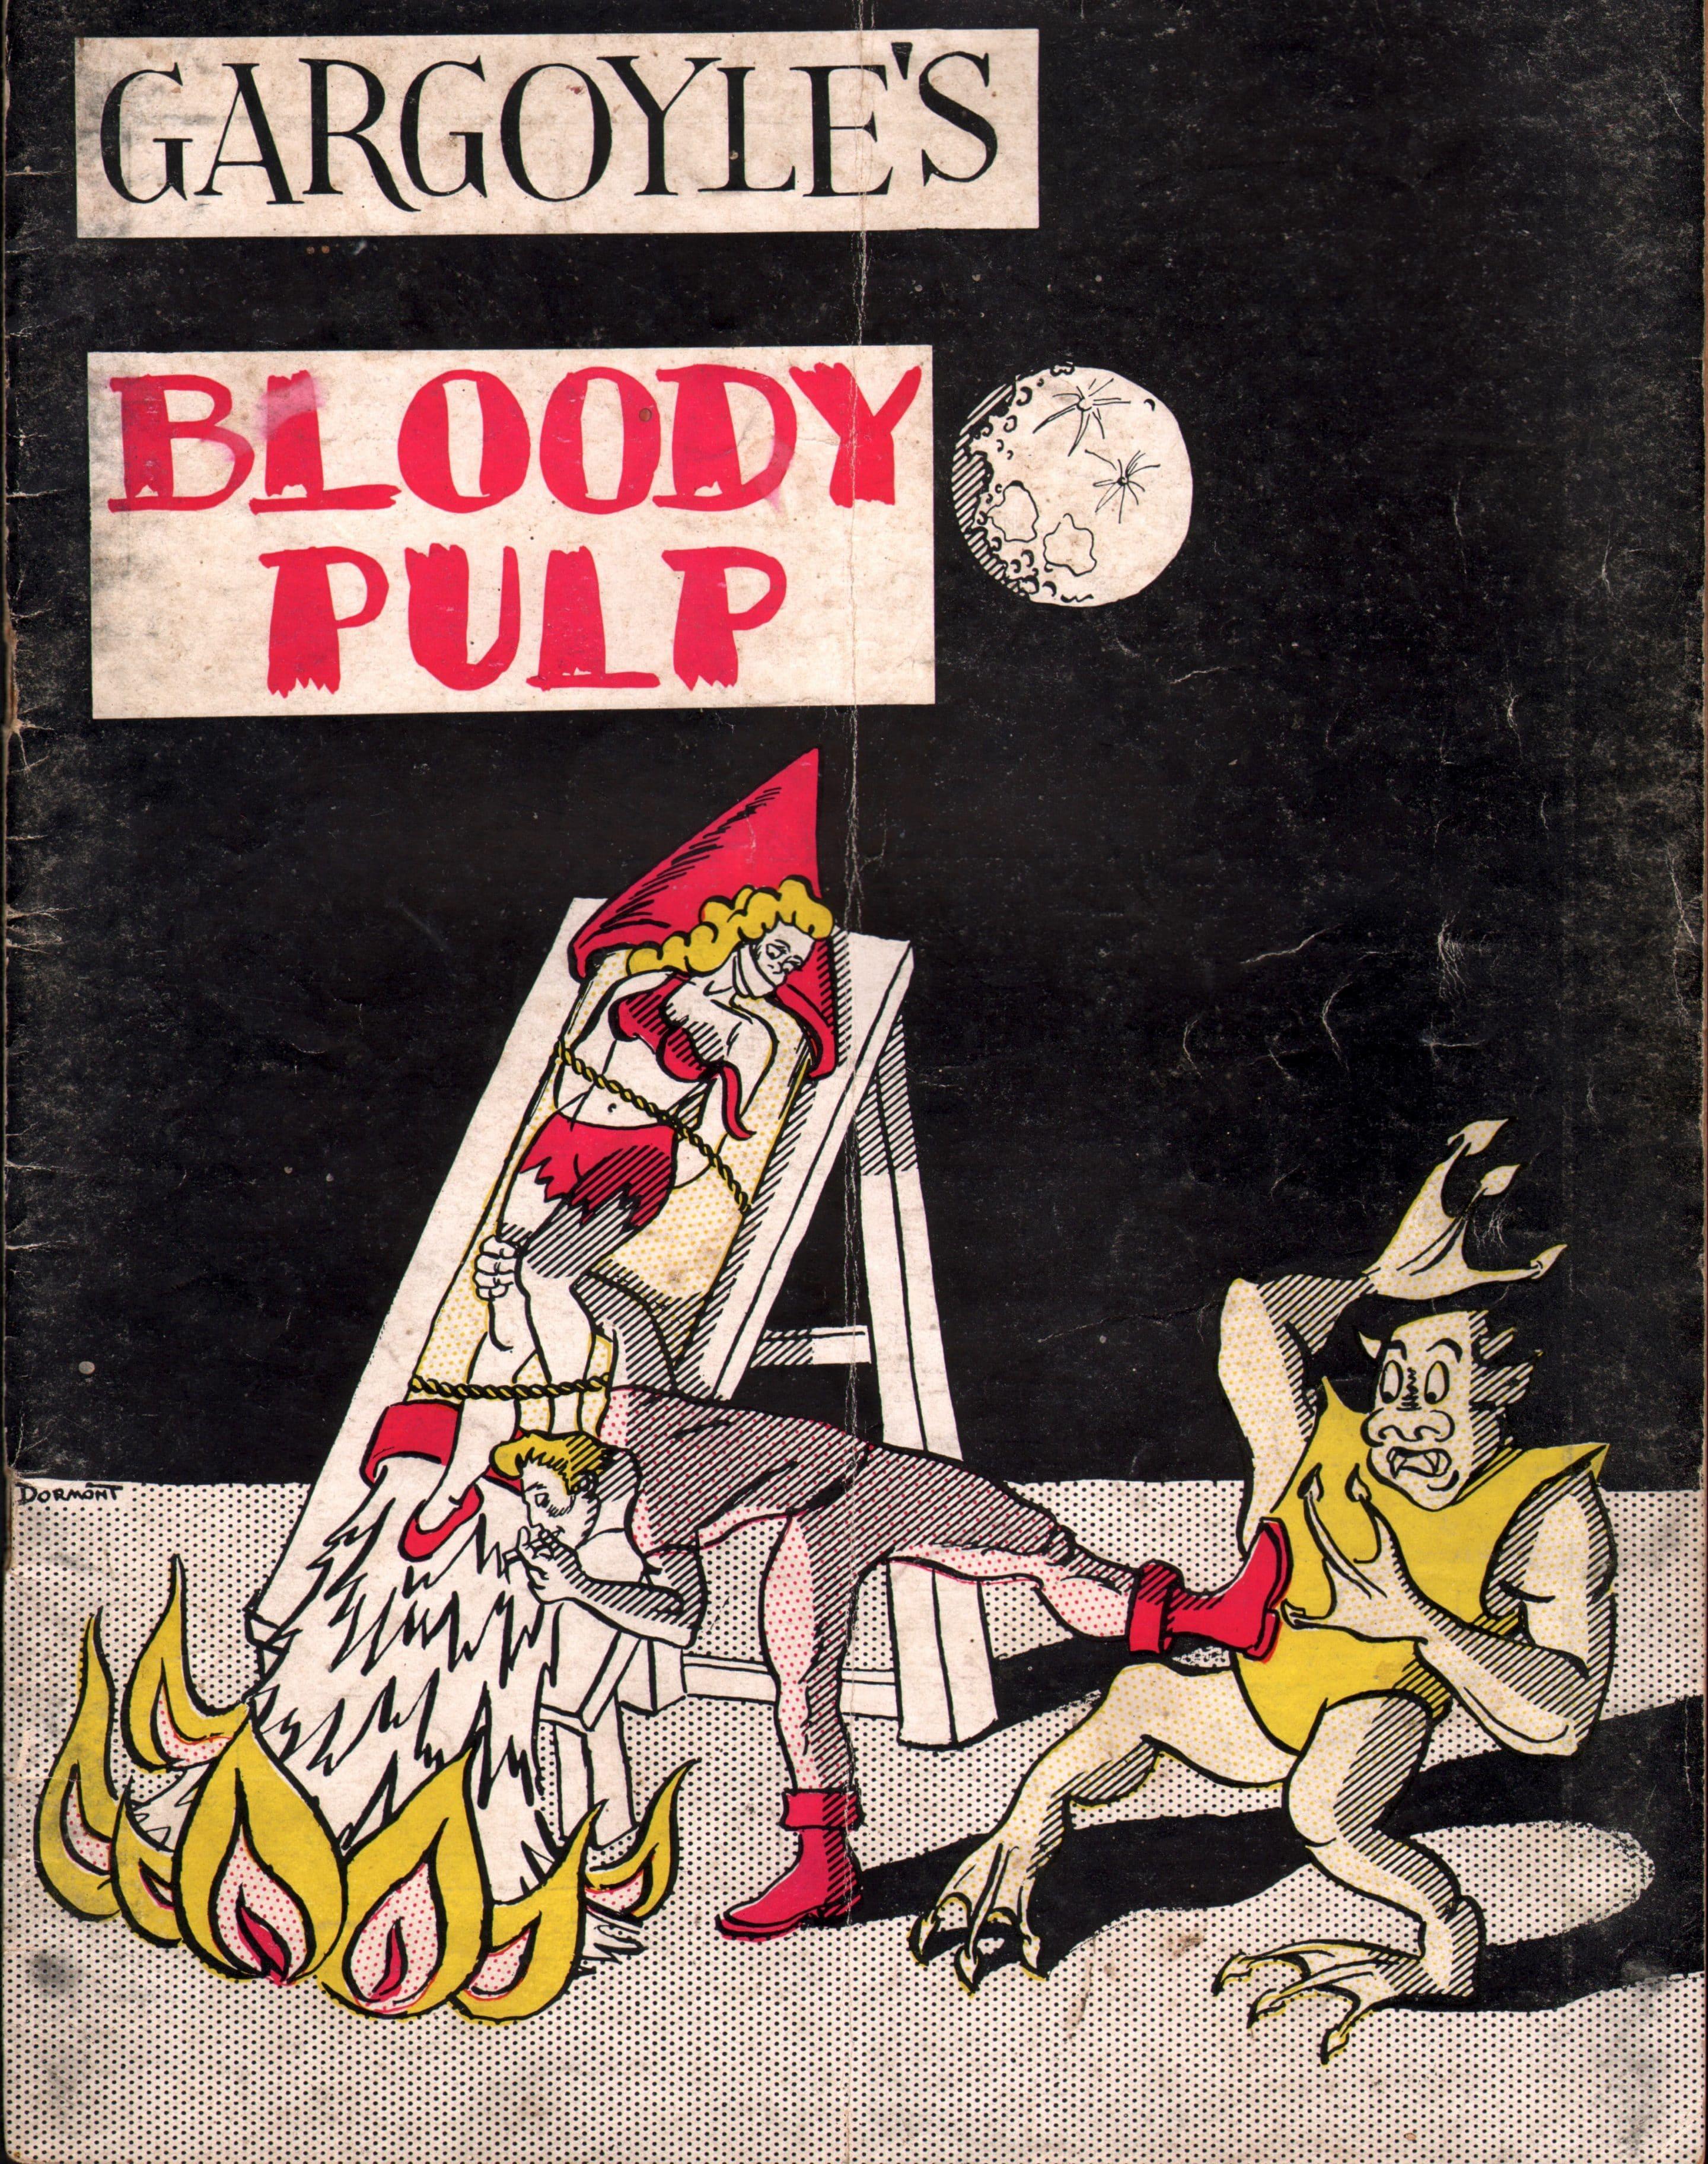 Gargoyle's Bloody Pulp